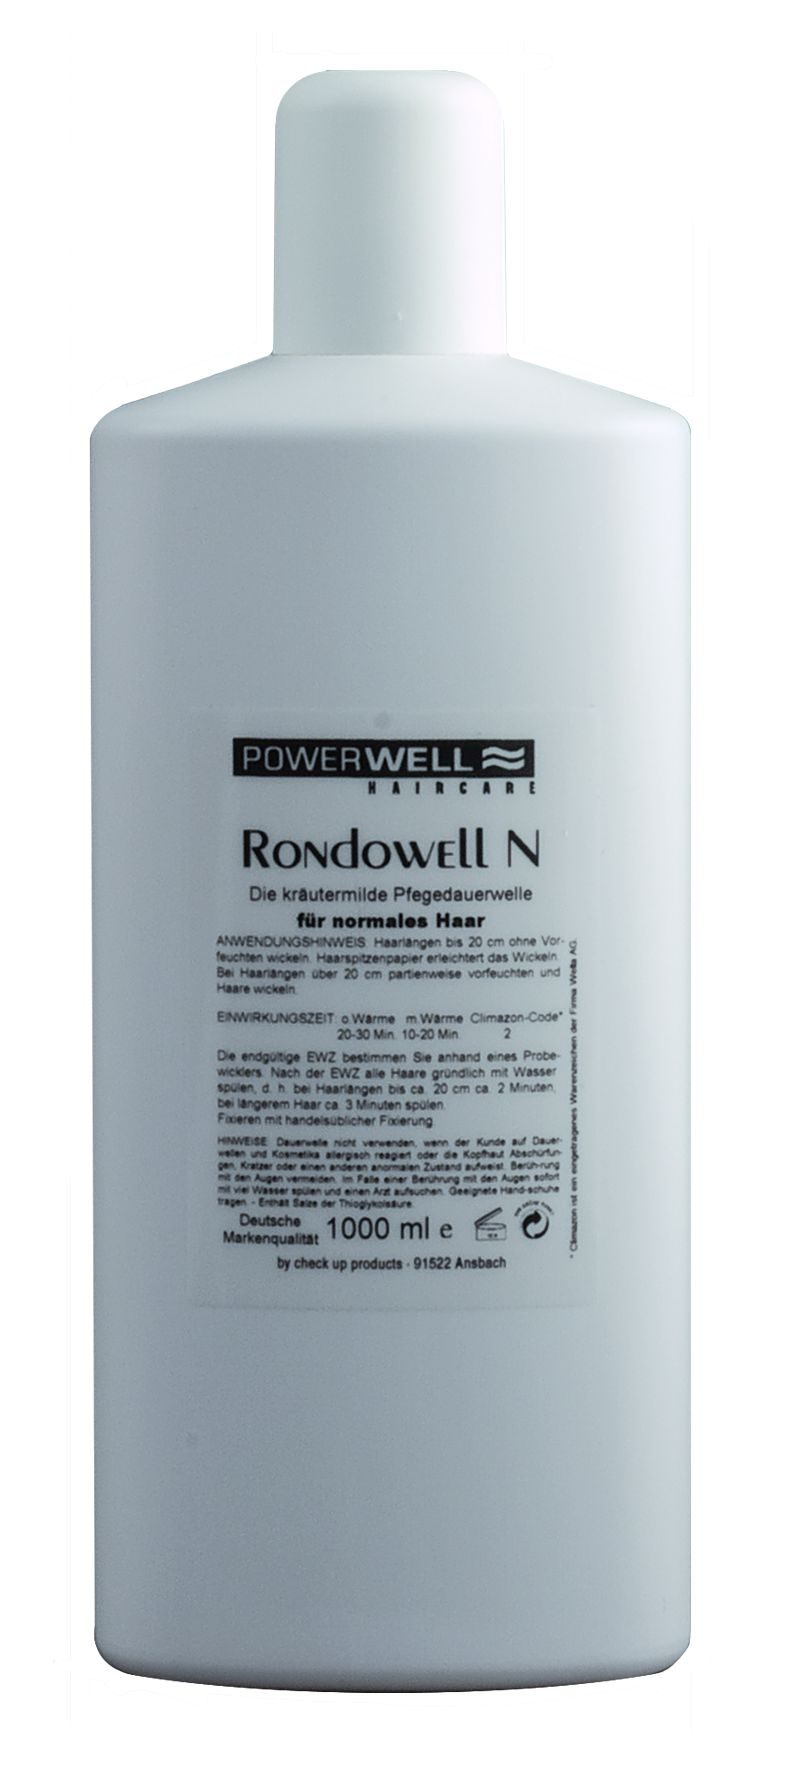 POWERWELL Rondowell Dauerwelle FORTE 1 L